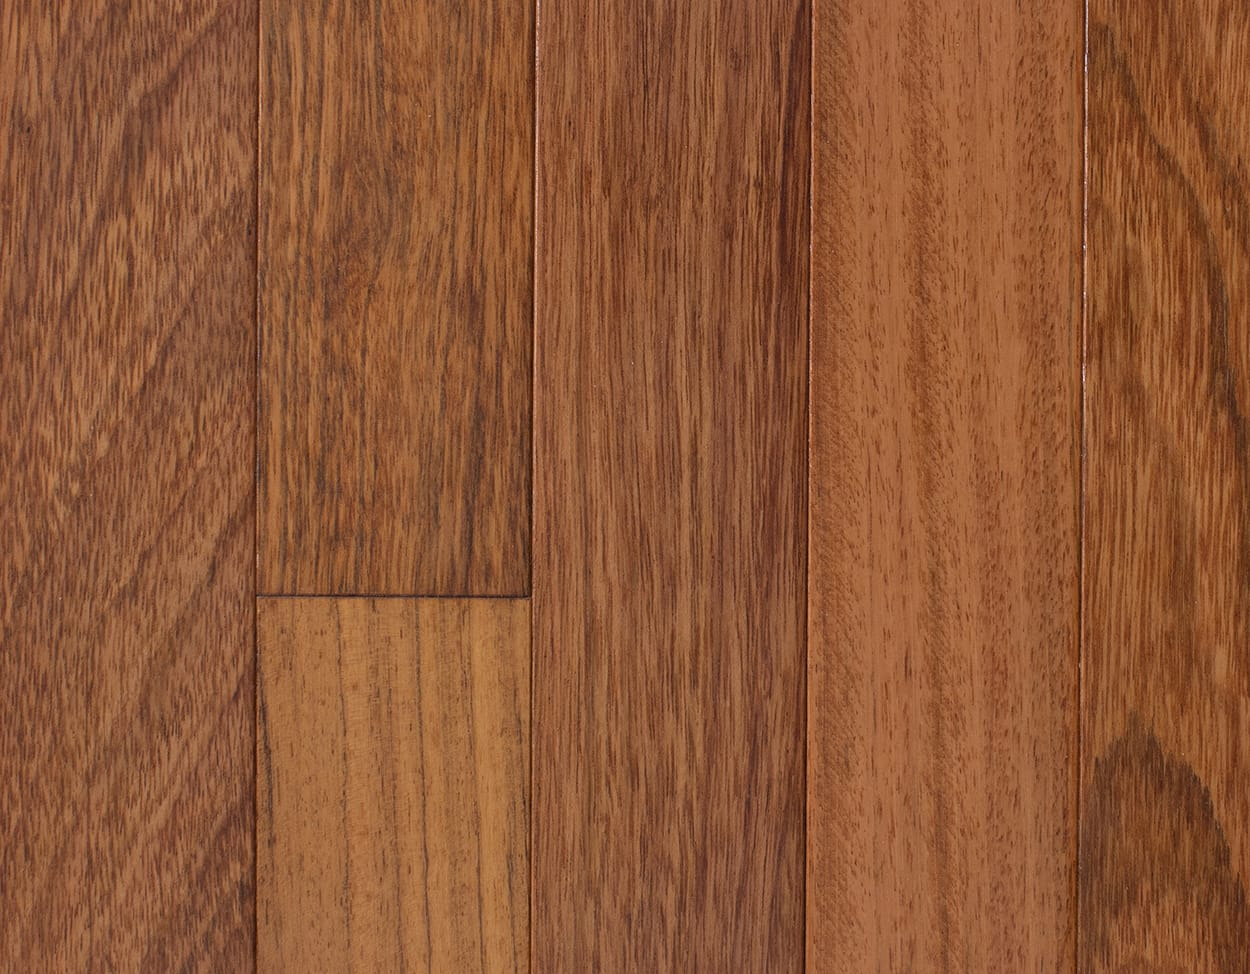 Mullican Meadow Brooke 3 Inch Brazilian Cherry Natural (Sample) Hardwood Flooring